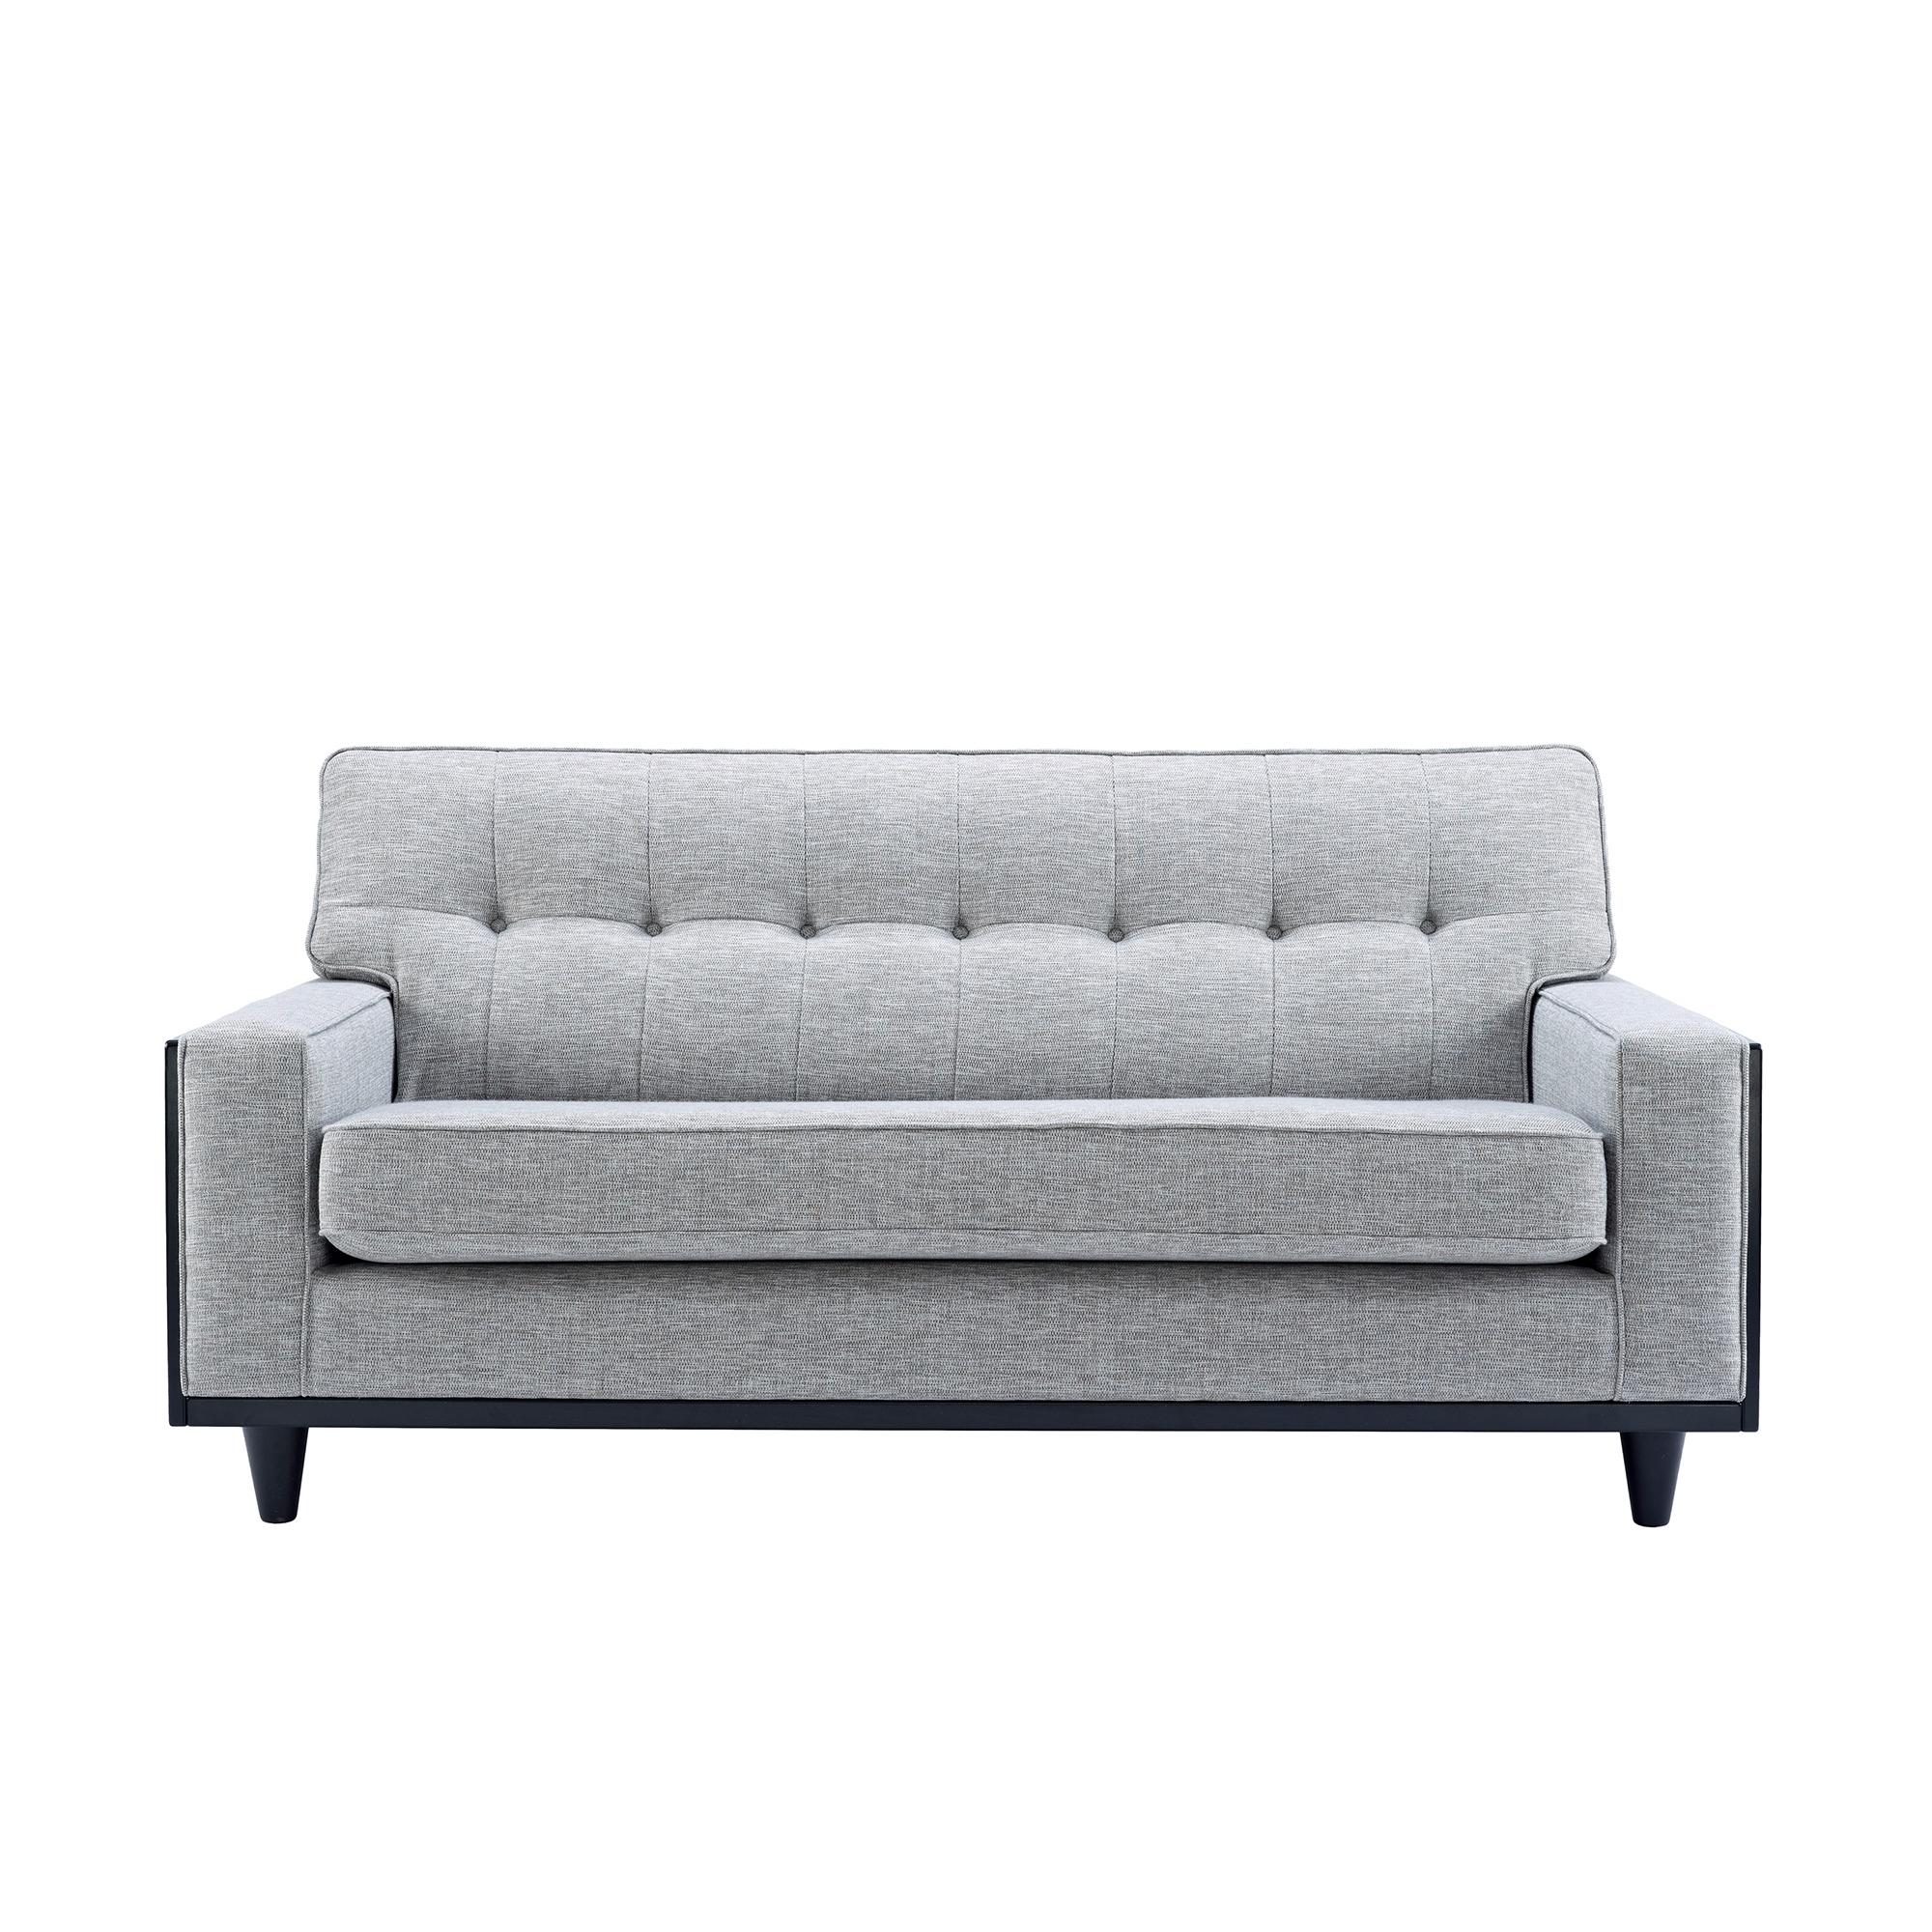 G plan vintage fifty nine small sofa